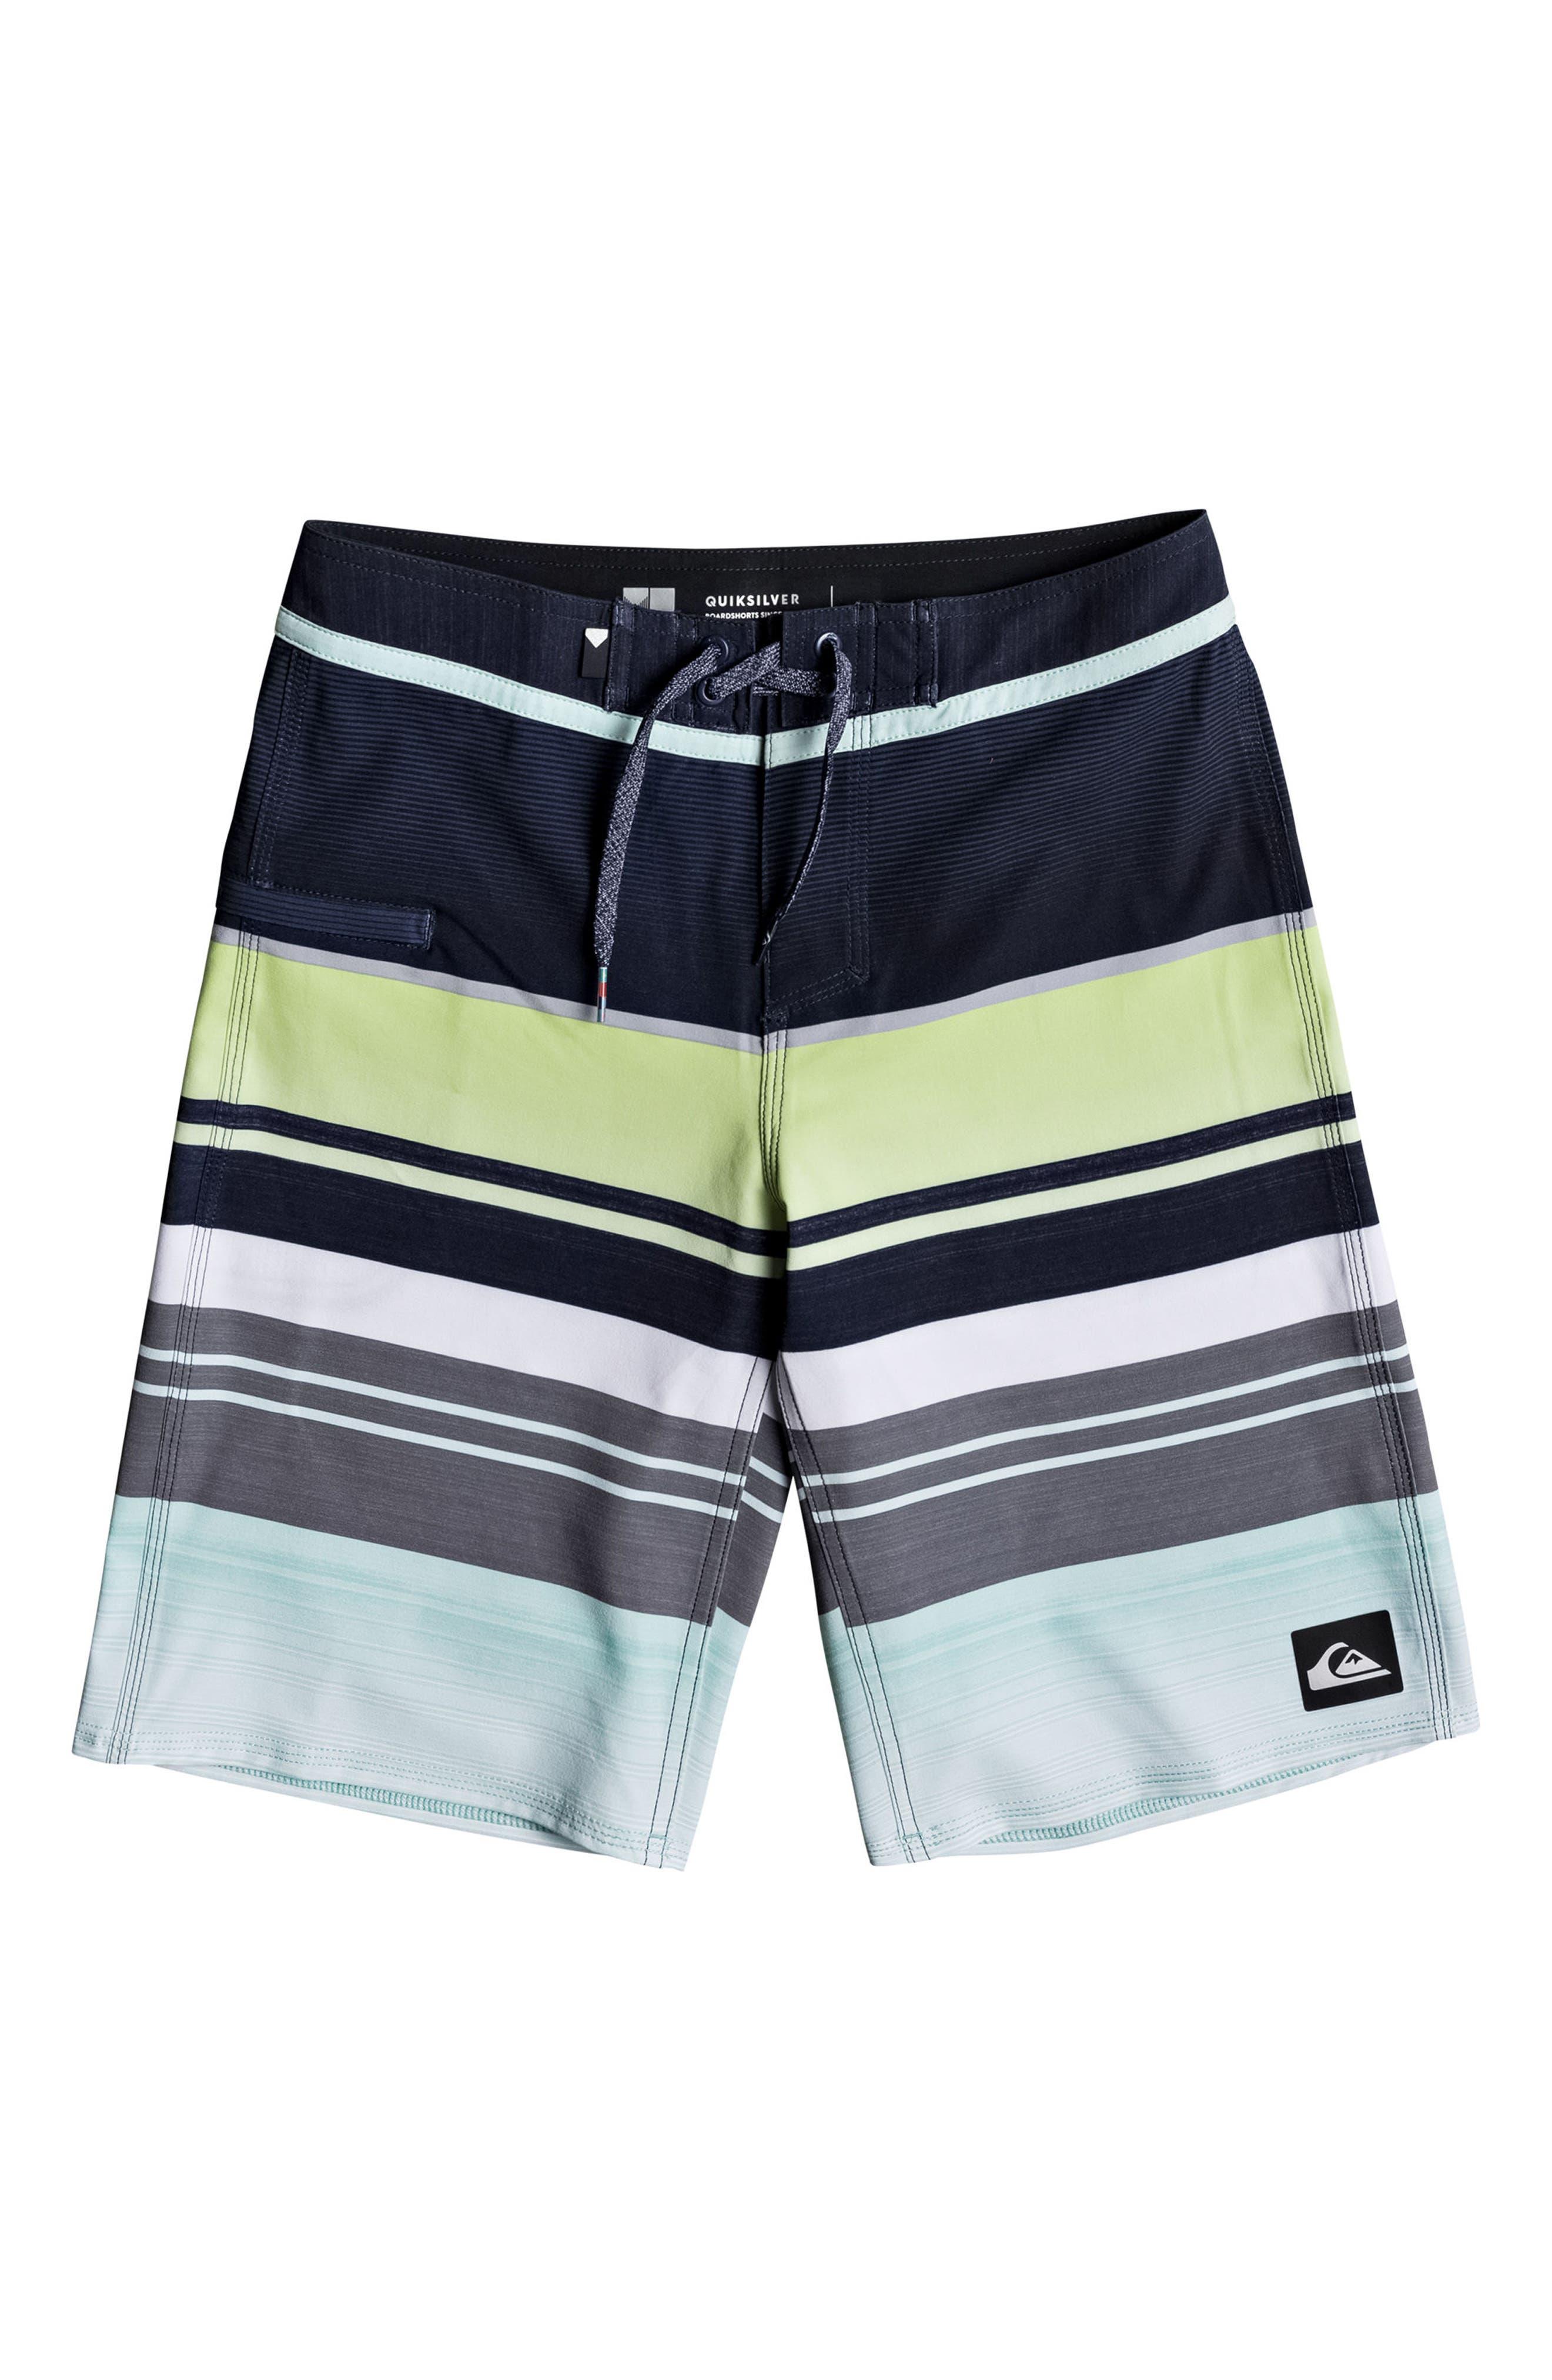 Alternate Image 1 Selected - Quiksilver Everyday Stripe Vee Board Shorts (Big Boys)